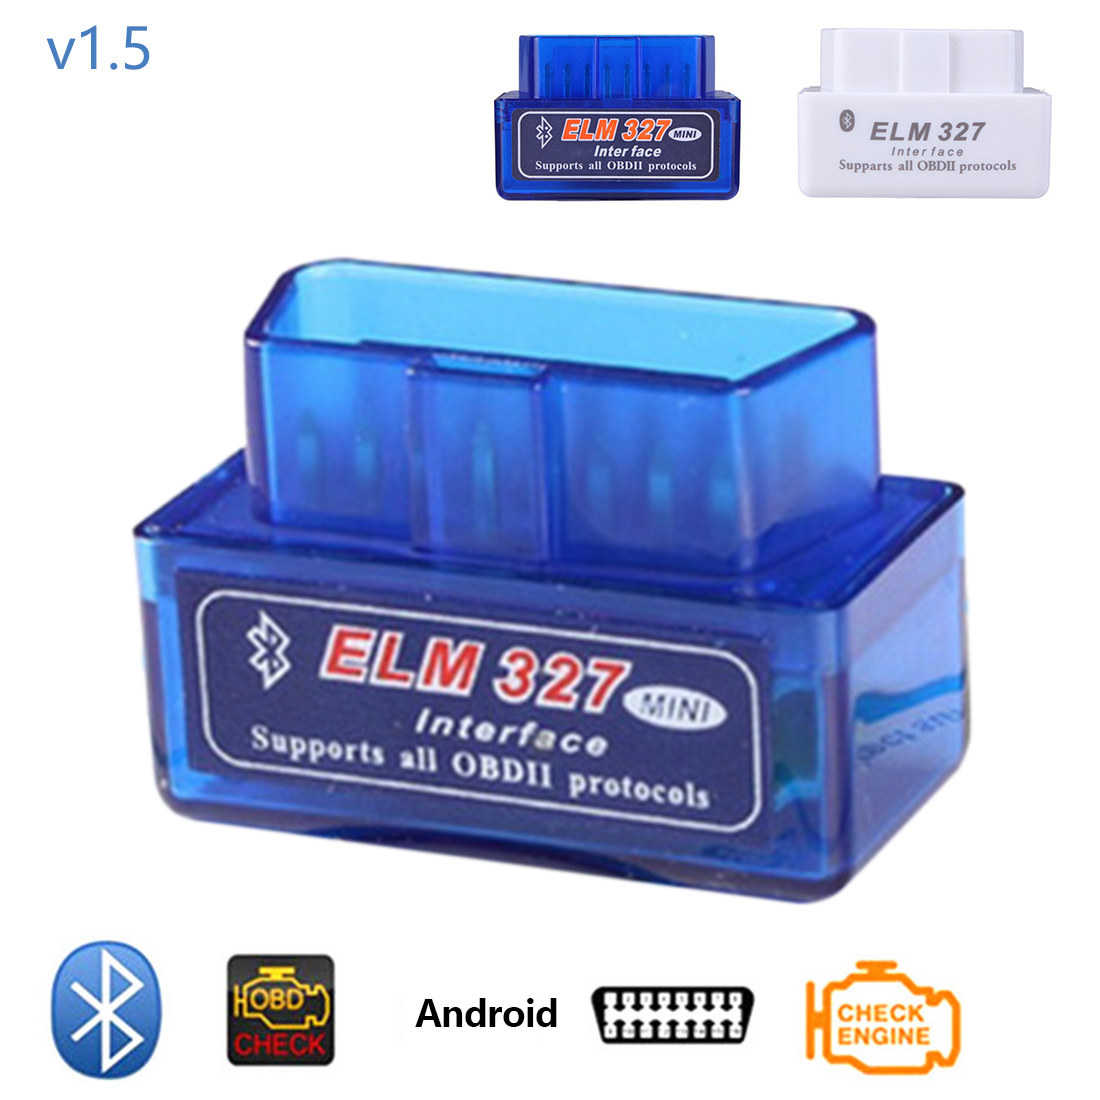 Dewtreetali с PIC18F25K80 V1.5 супер мини ELM327 Bluetooth ELM 327 V1.5 чип OBD2/OBDII для Android Крутящий момент автомобиль товара читатель